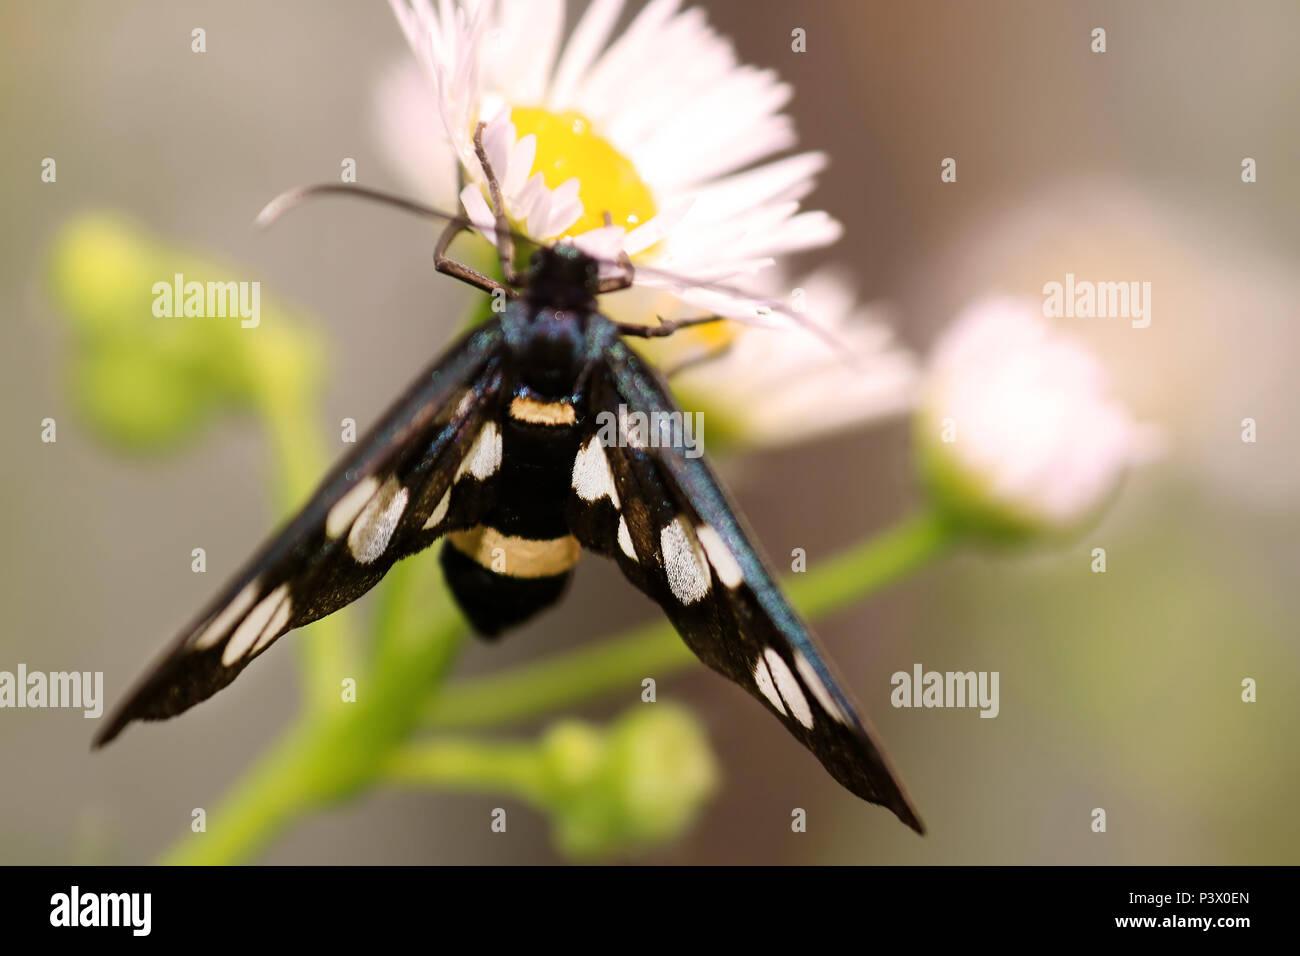 Nine-spotted moth or yellow belted burnet, Amata phegea, formerly Syntomis phegea on chamomile flower. Selective focus - Stock Image